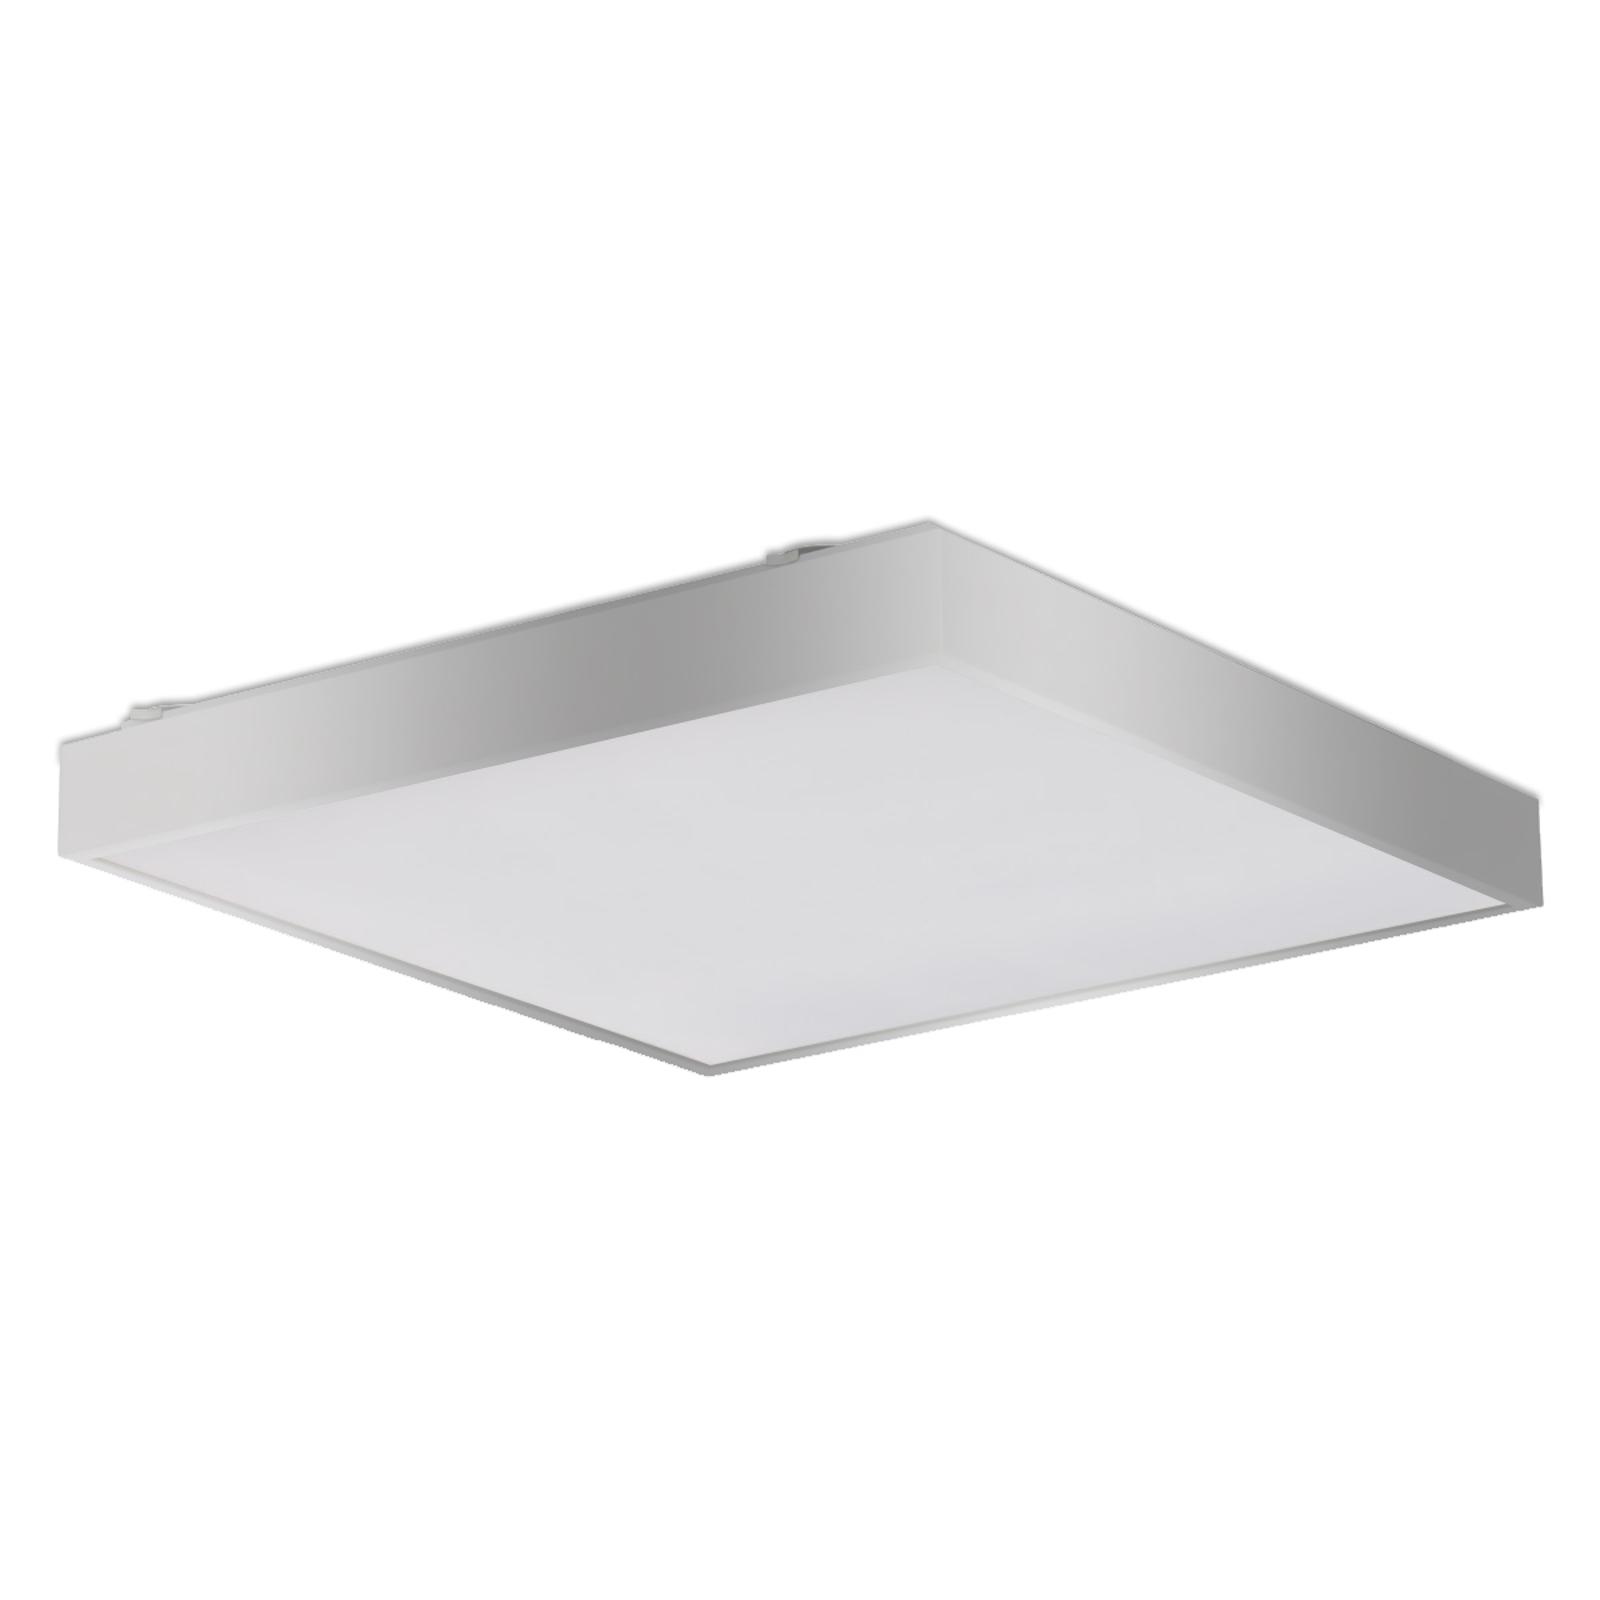 Oszczędna lampa sufitowa Q6 srebrna EVG